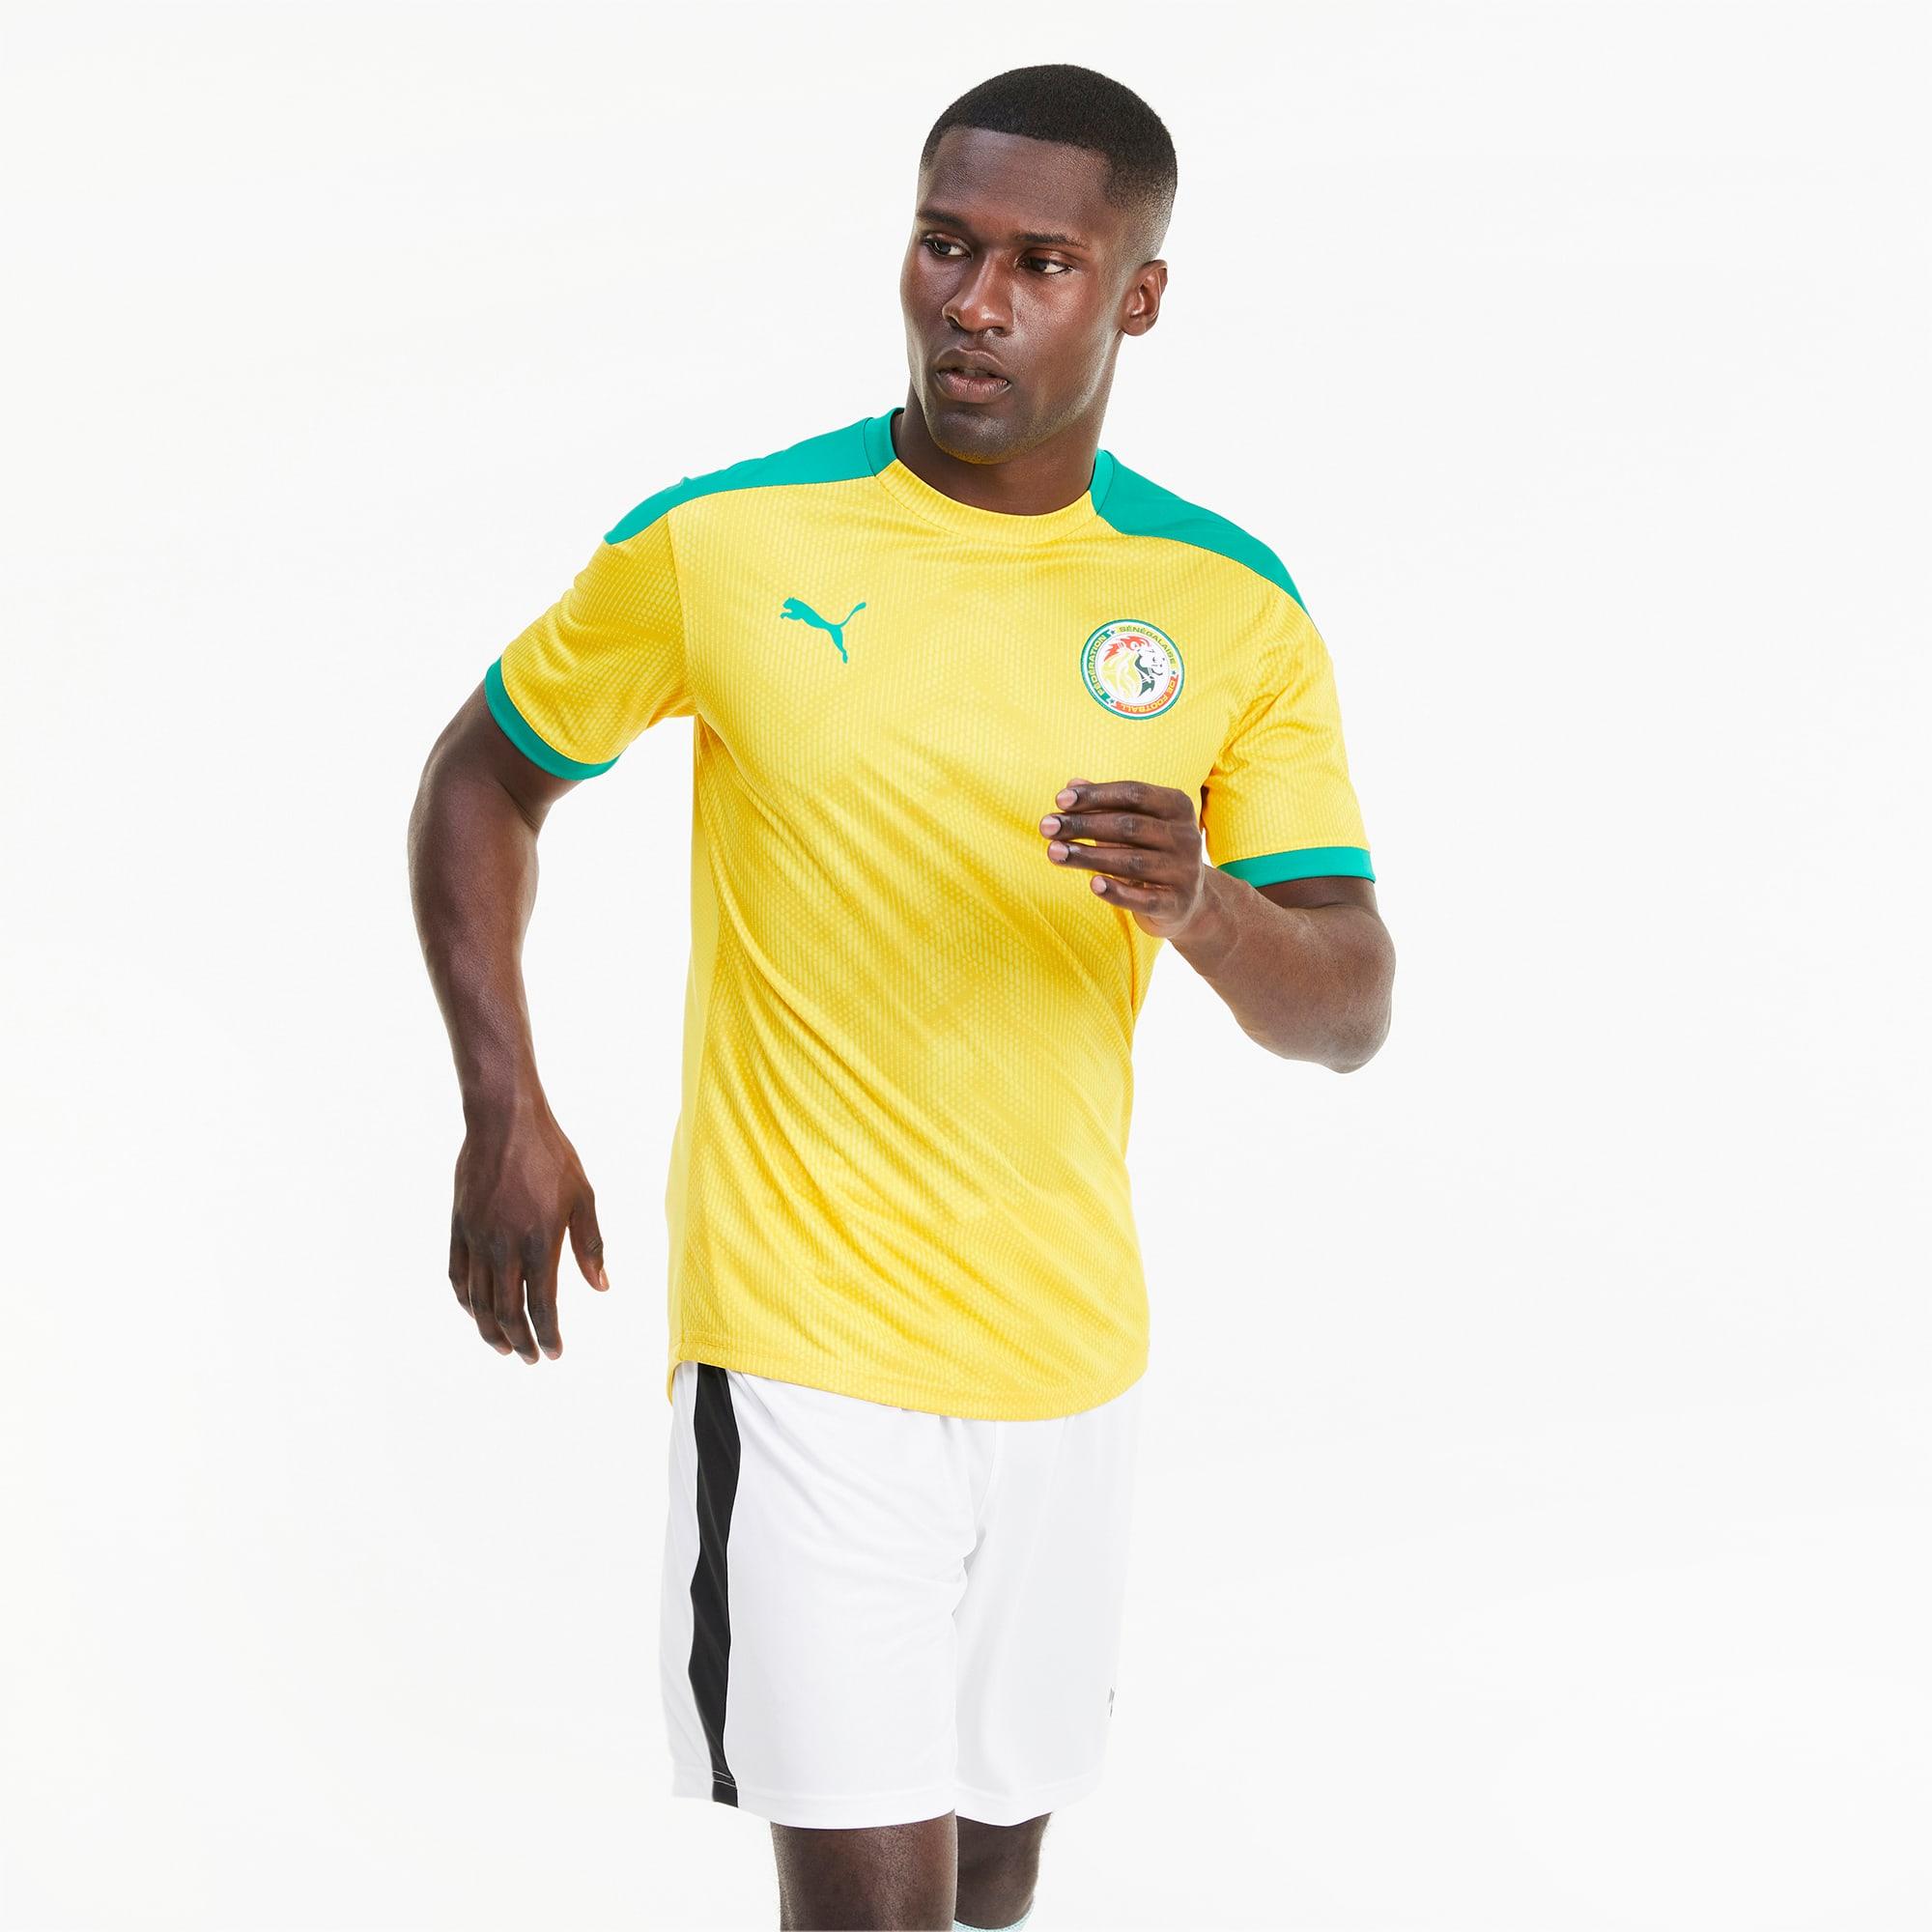 Senegal Stadium men's jersey, Green/Yellow, Size S   PUMA, - ,Puma ...